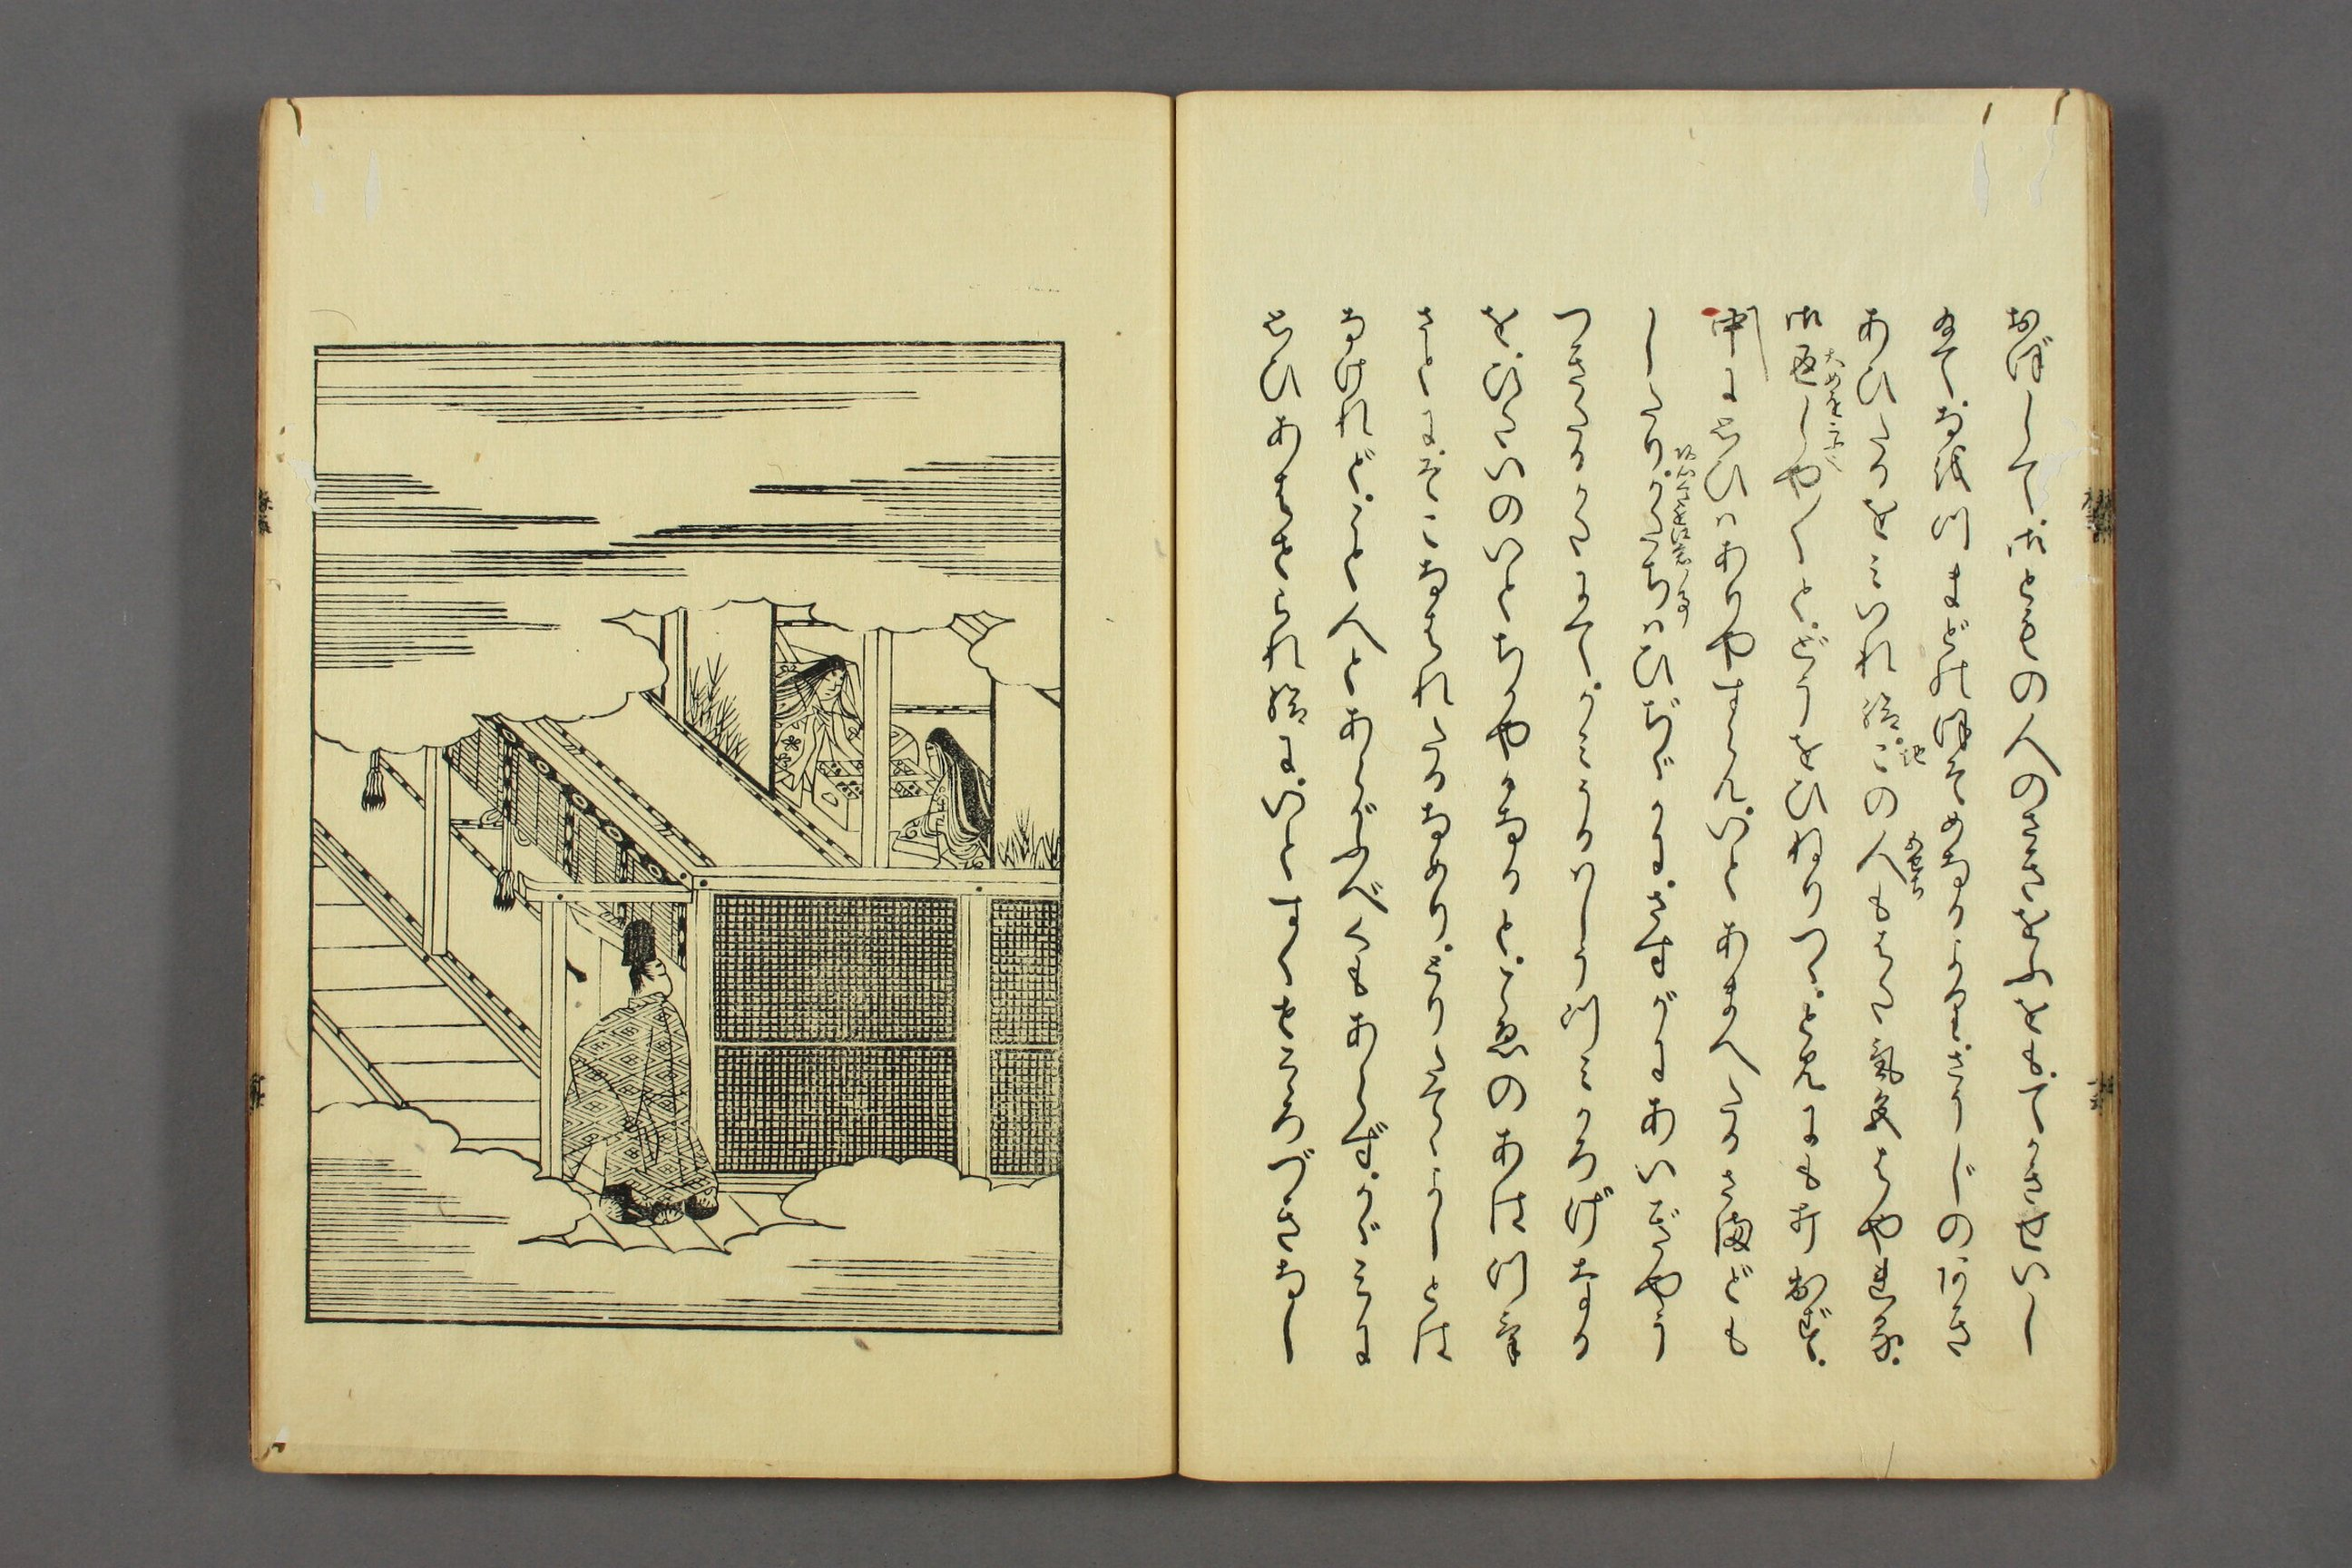 http://archive.wul.waseda.ac.jp/kosho/bunko30/bunko30_a0007/bunko30_a0007_0026/bunko30_a0007_0026_p0018.jpg